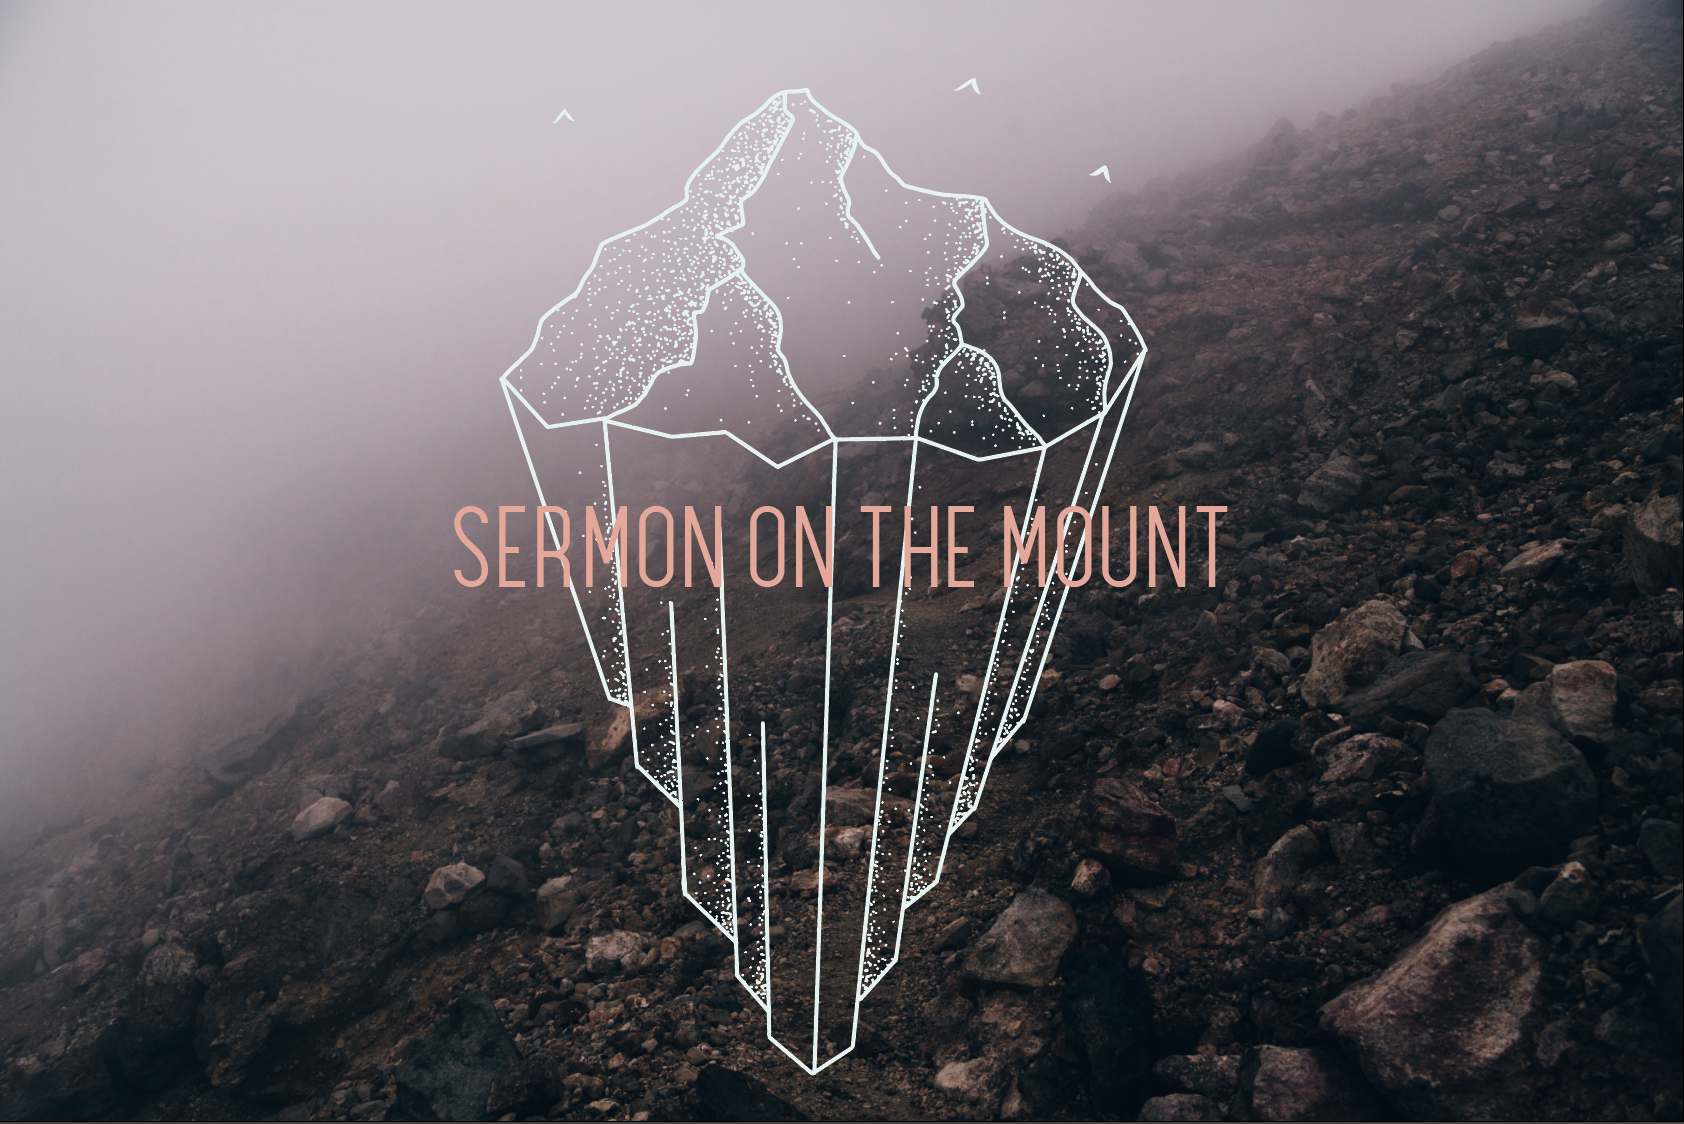 Sermon On The Mount Series // Fall 2017